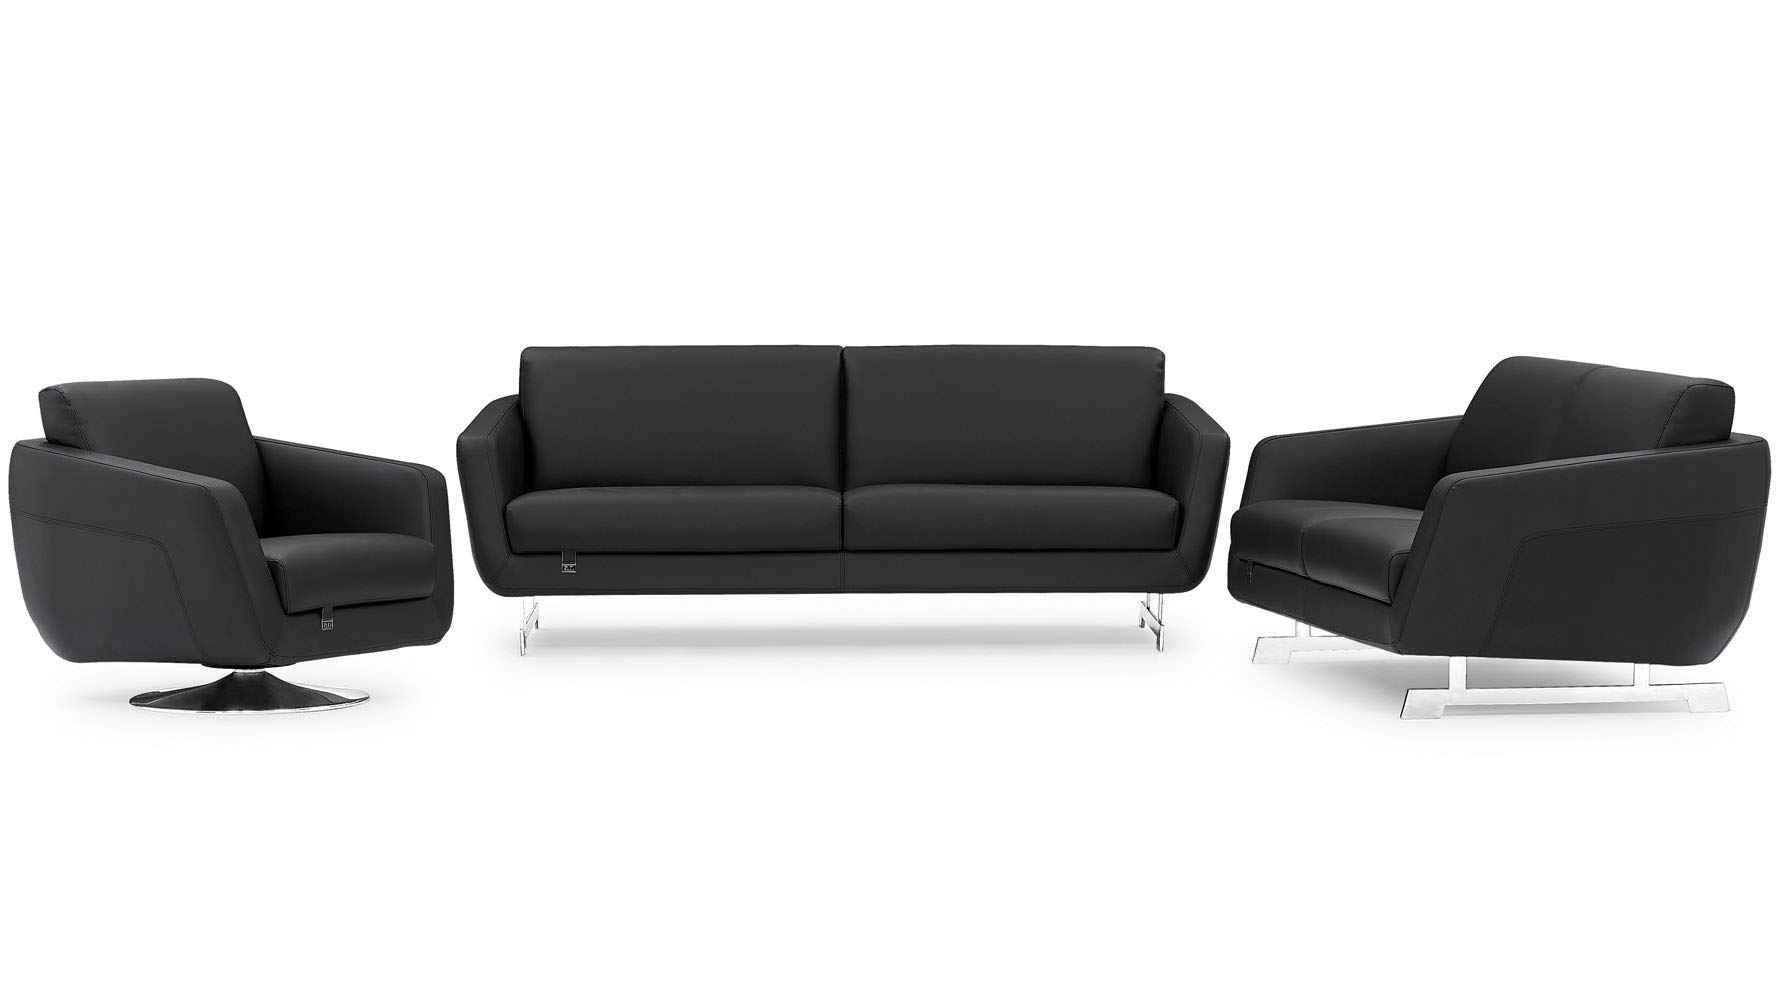 Zuri Furniture Modern Armondo Sofa Set with Loveseat and Chair in Black Microfiber and Genuine Leather by Zuri Furniture